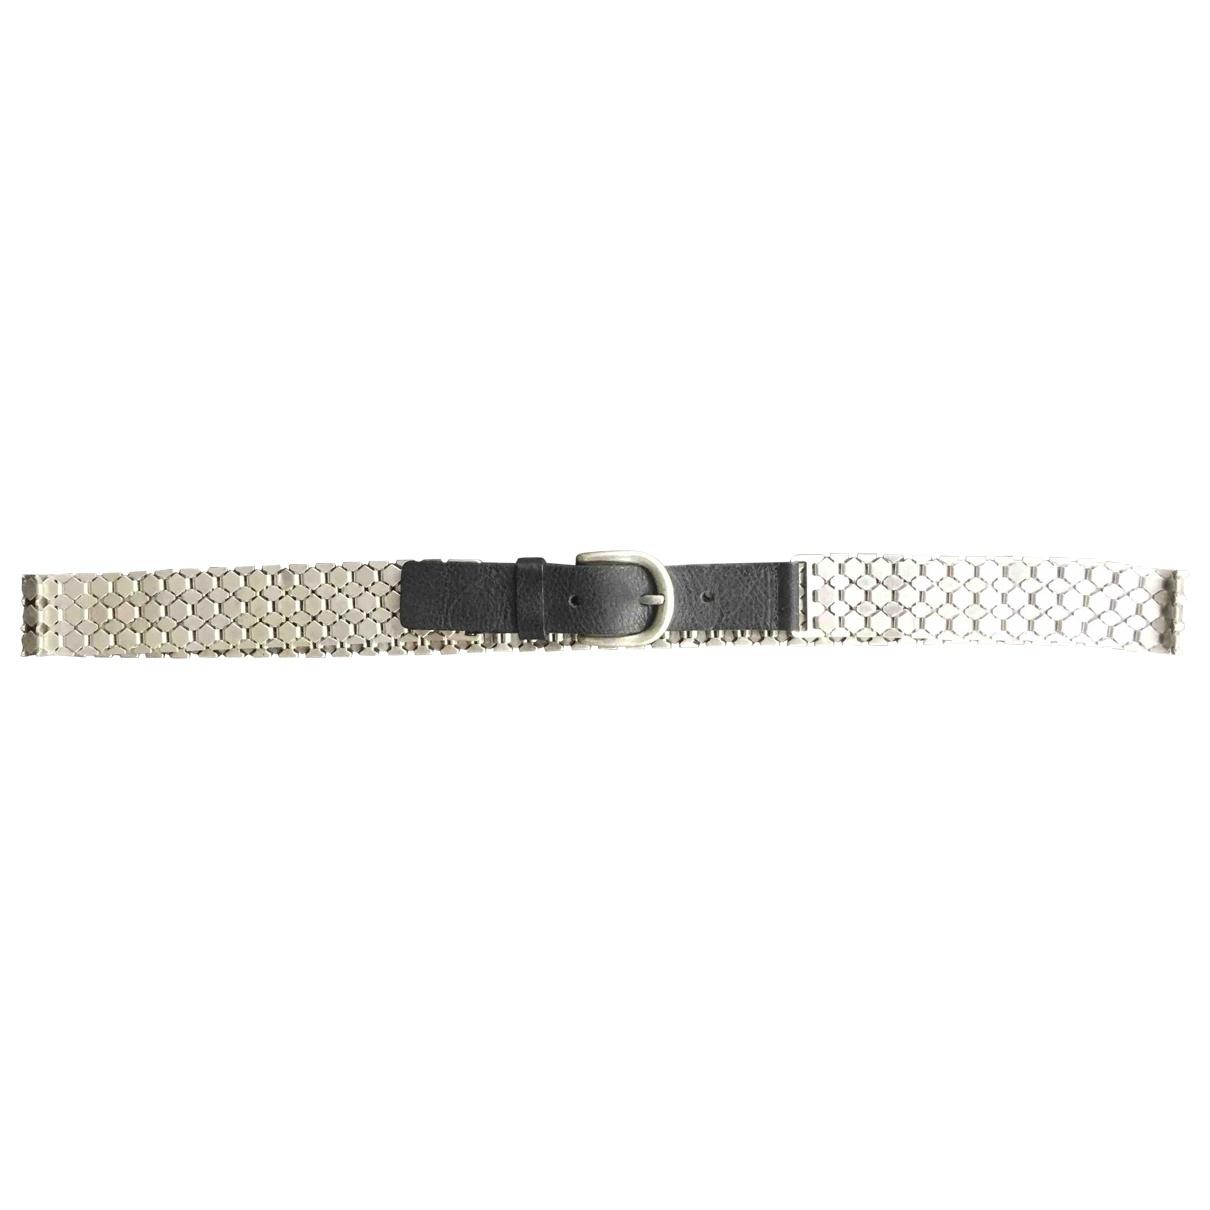 Isabel Marant Pour H&m \N Silver Leather belt for Women S International